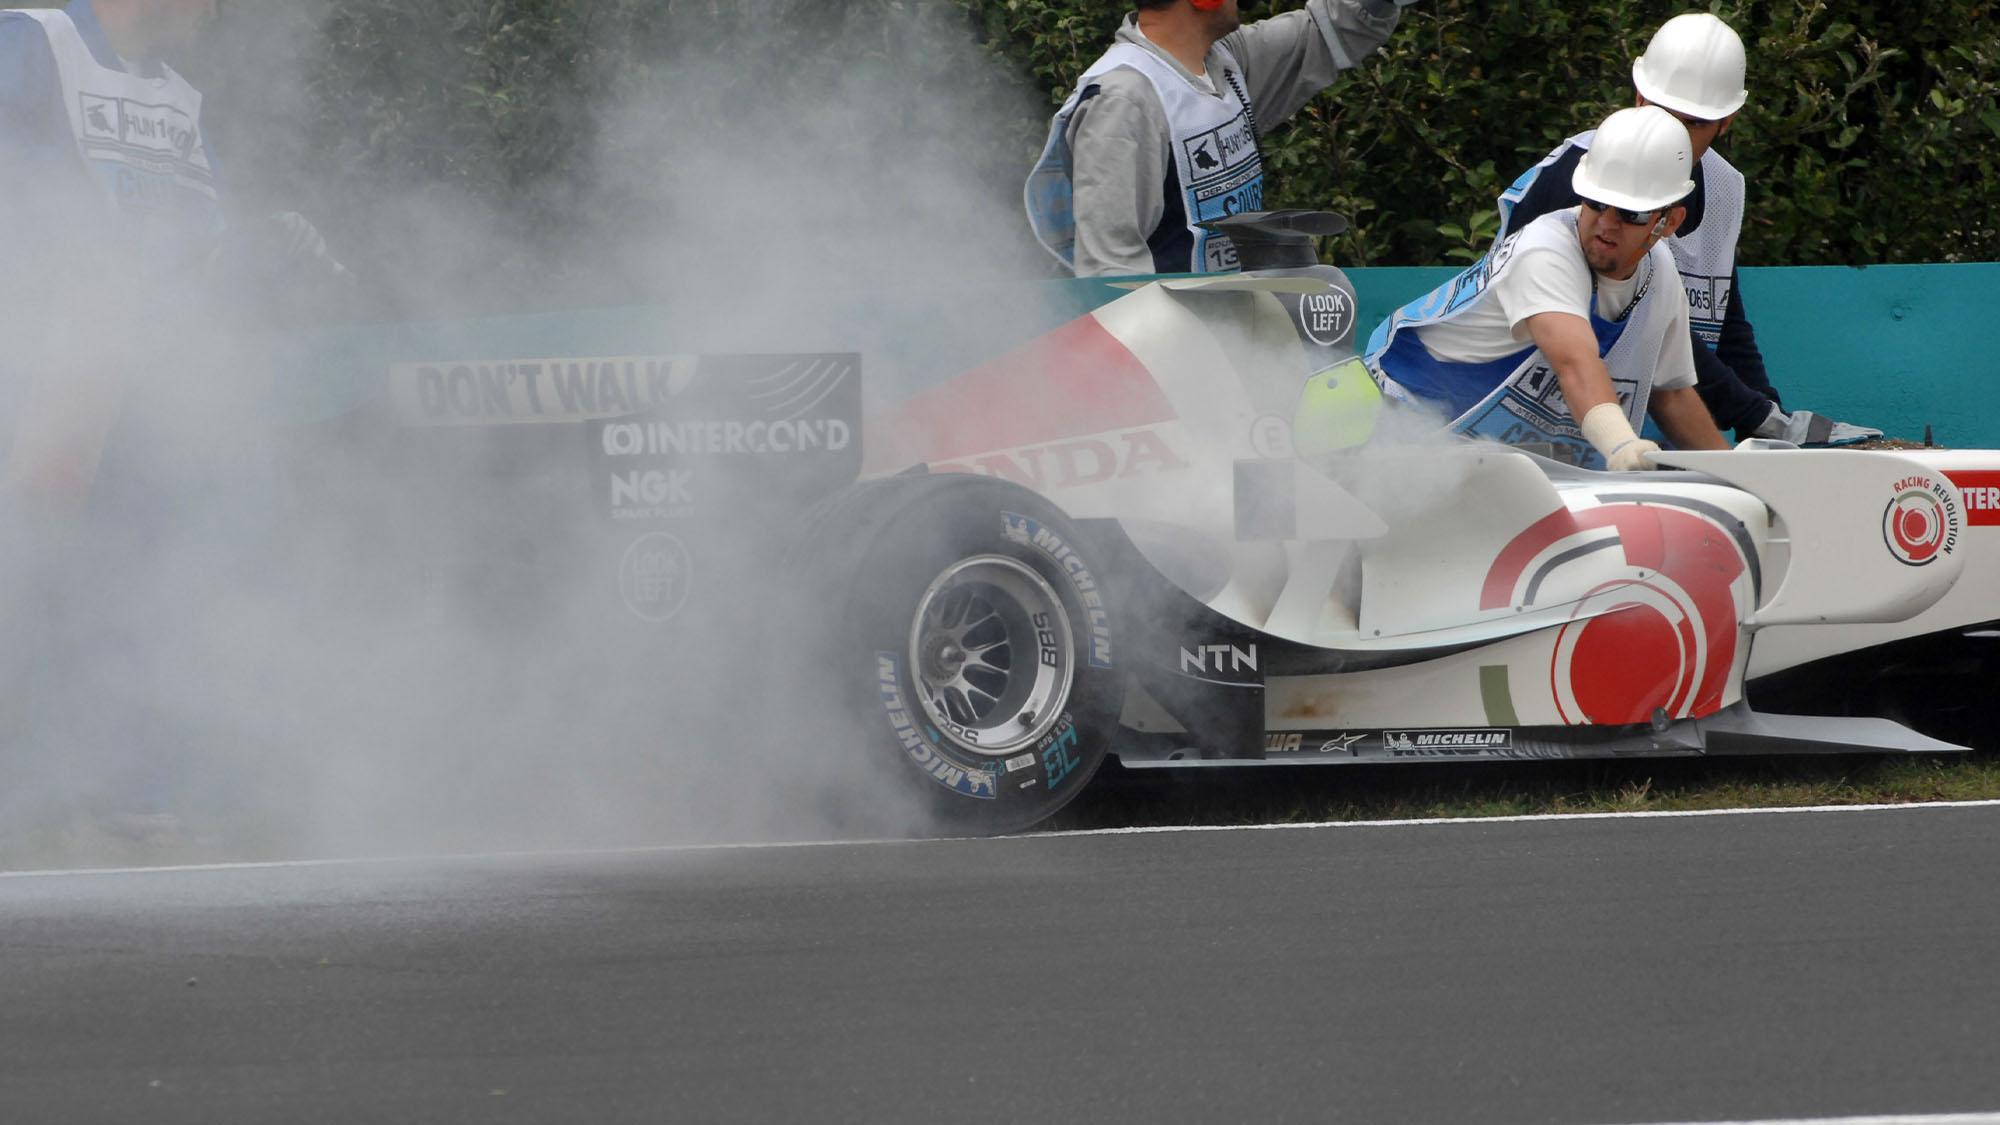 Honda engine blow